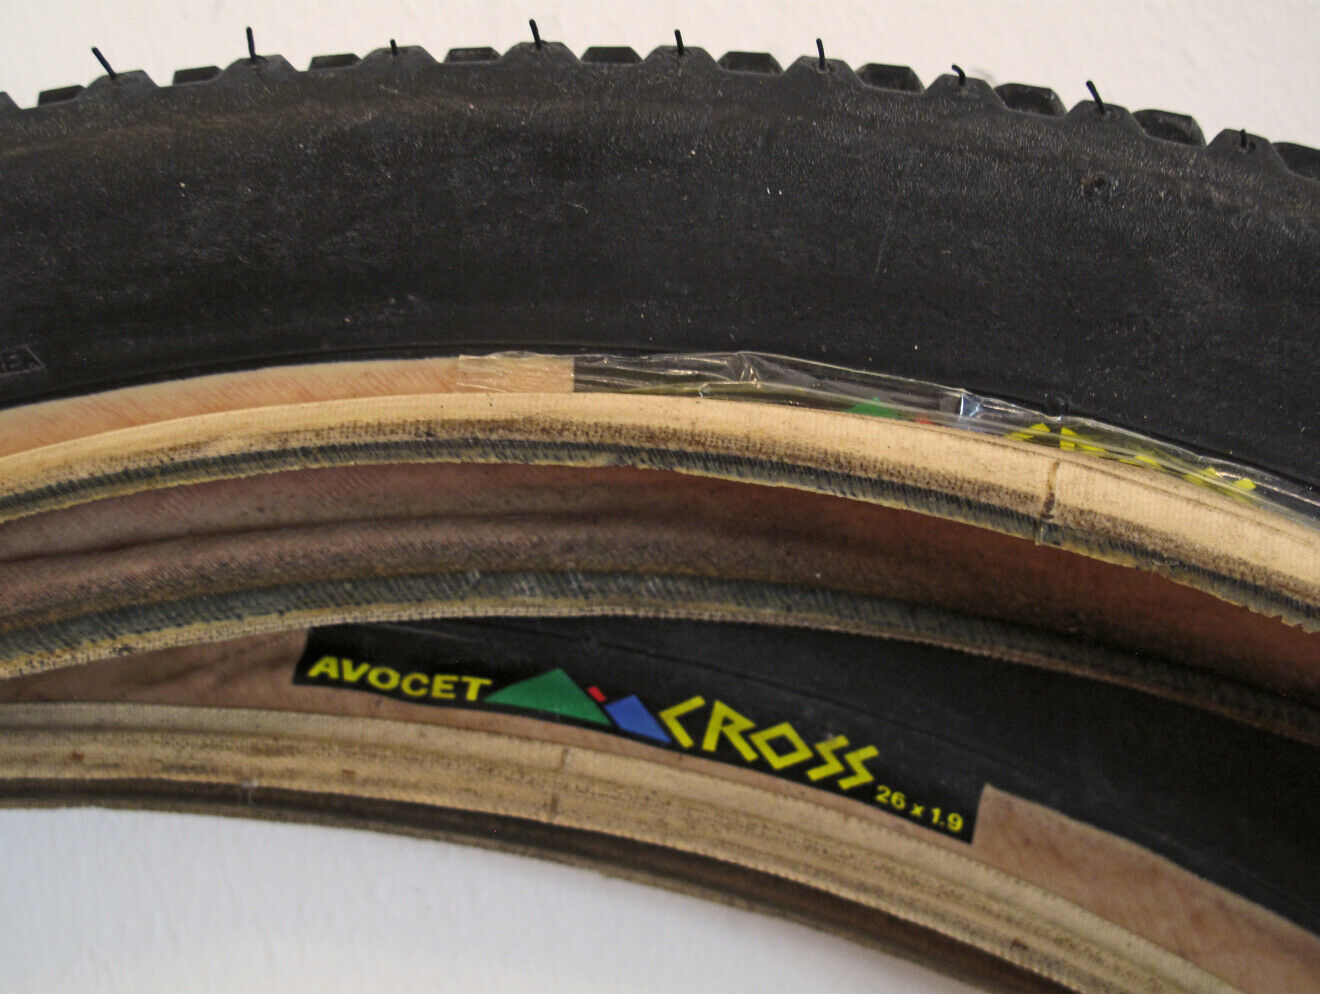 NOS Avocet Cross MTB tire Reifen vintage Neu RARE 1  Paar   one pair  outlet online